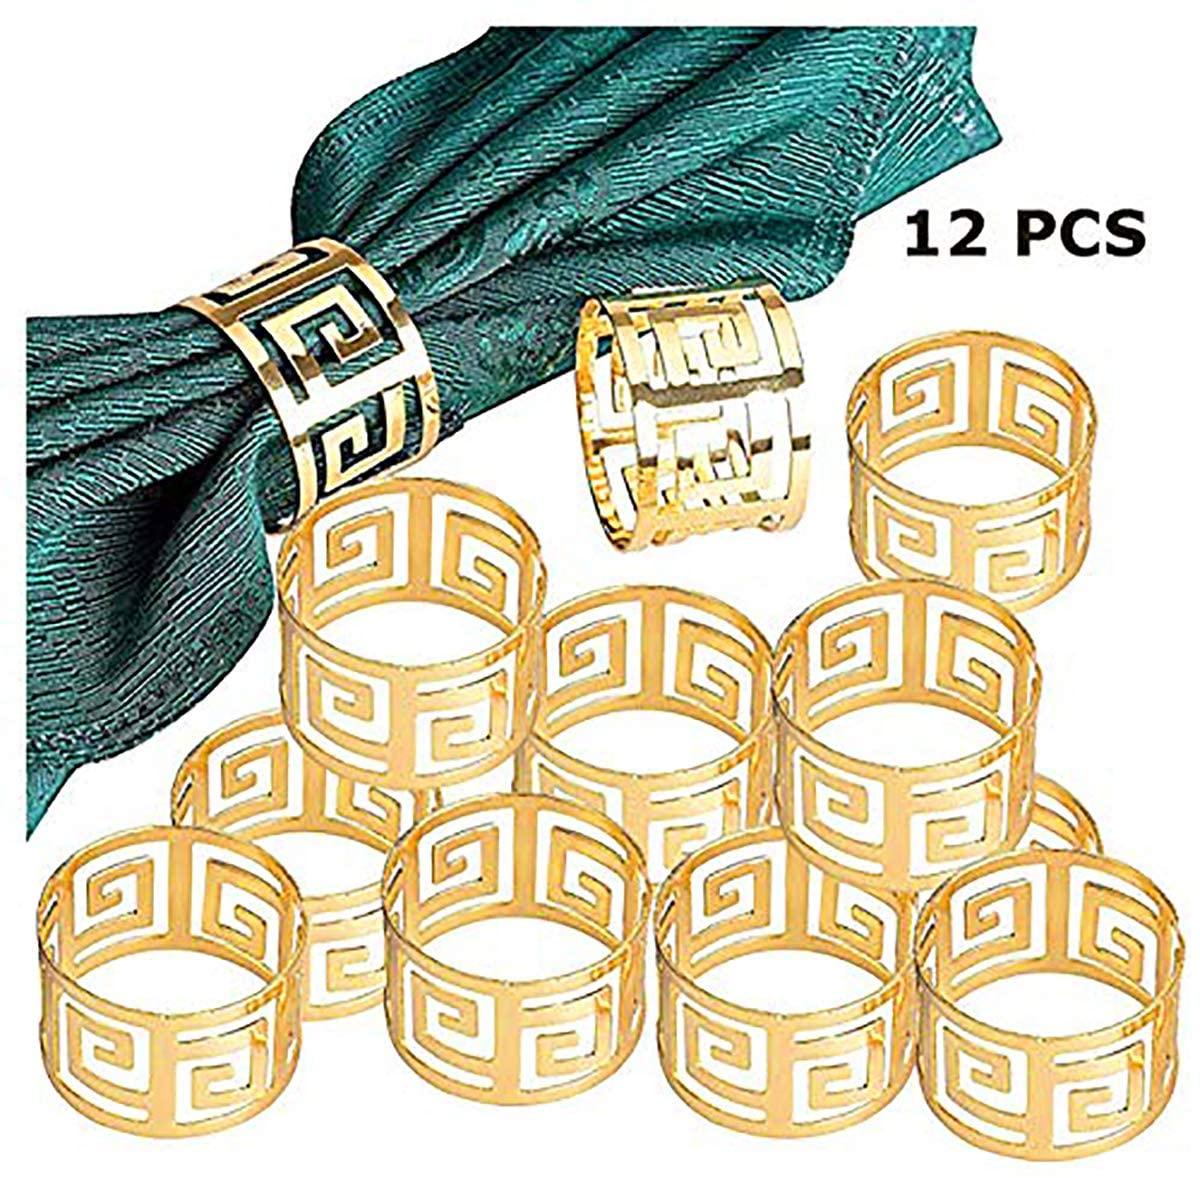 Napkin Ring, 12 Pcs Metal Napkin Holder for Wedding Party Dinner Table Decoration (Gold)